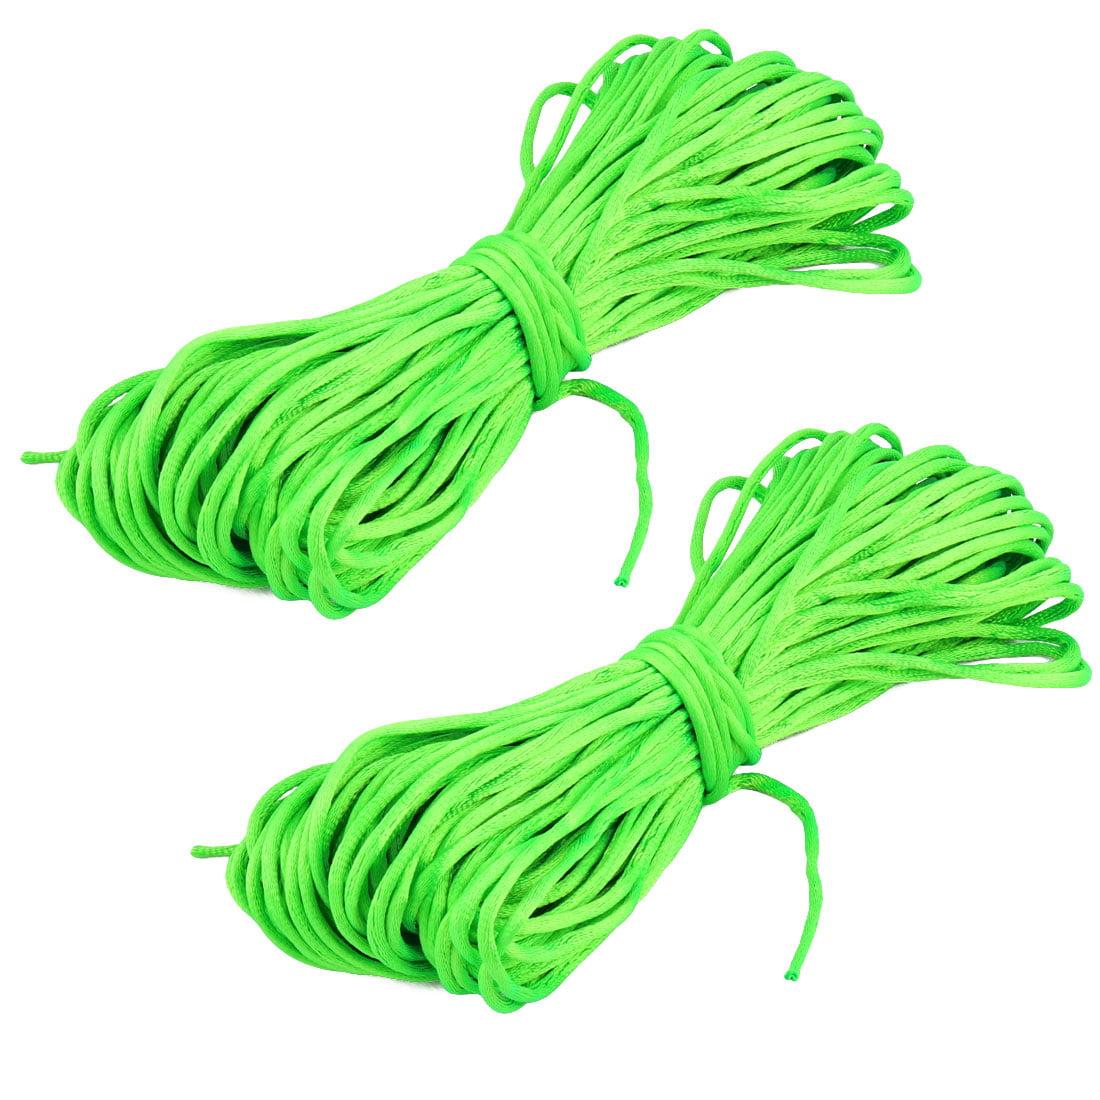 Nylon DIY Chinese Knot Bracelet Jewelry Beading Cord Light Green 22 Yards 2pcs